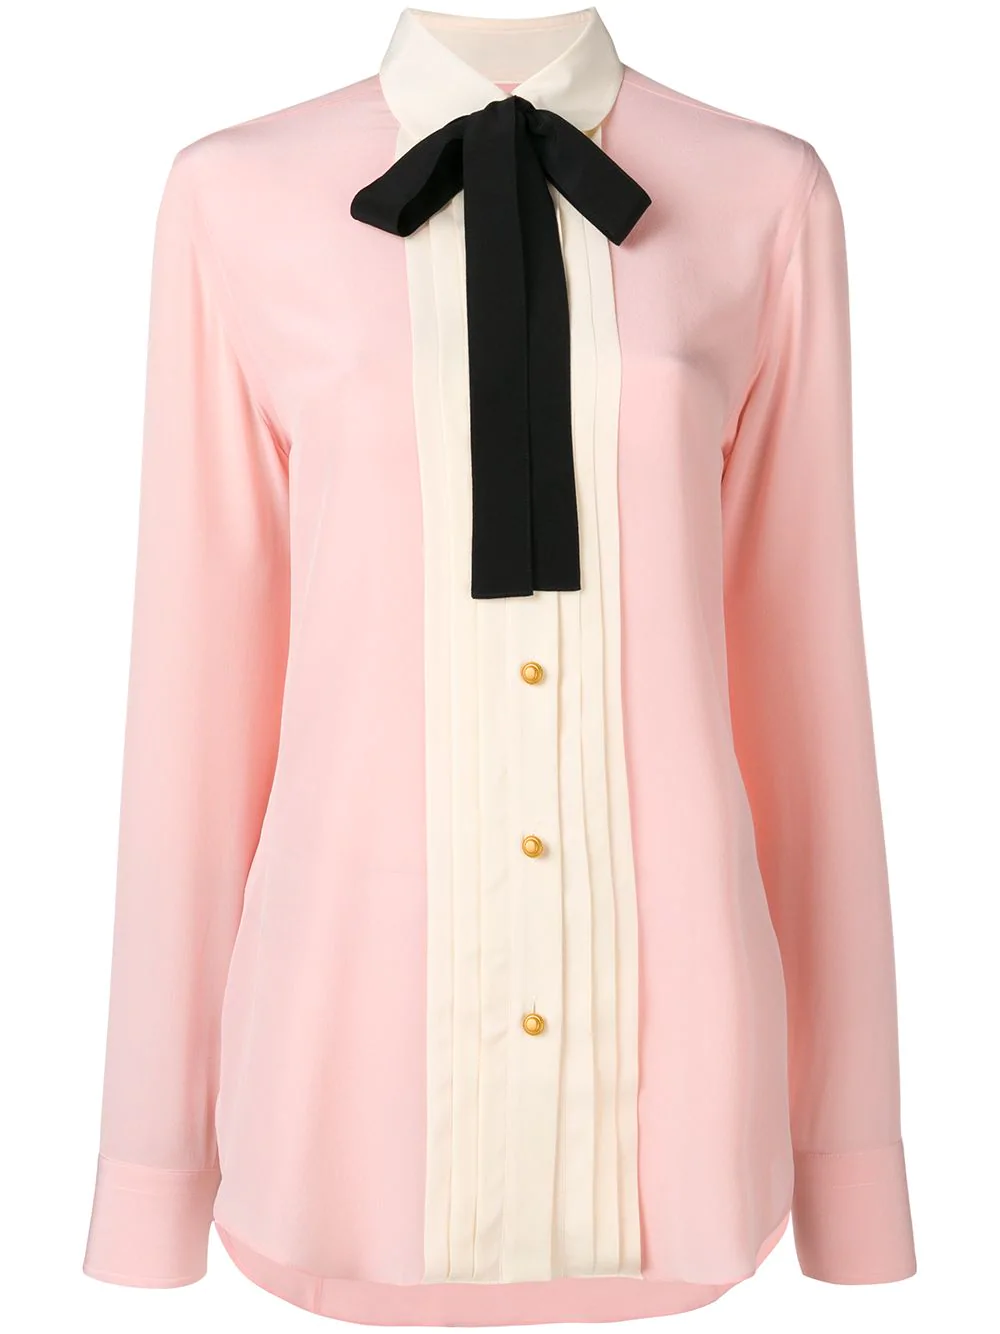 780eb1f39 Shop Gucci Blouses for Women | ModeSens